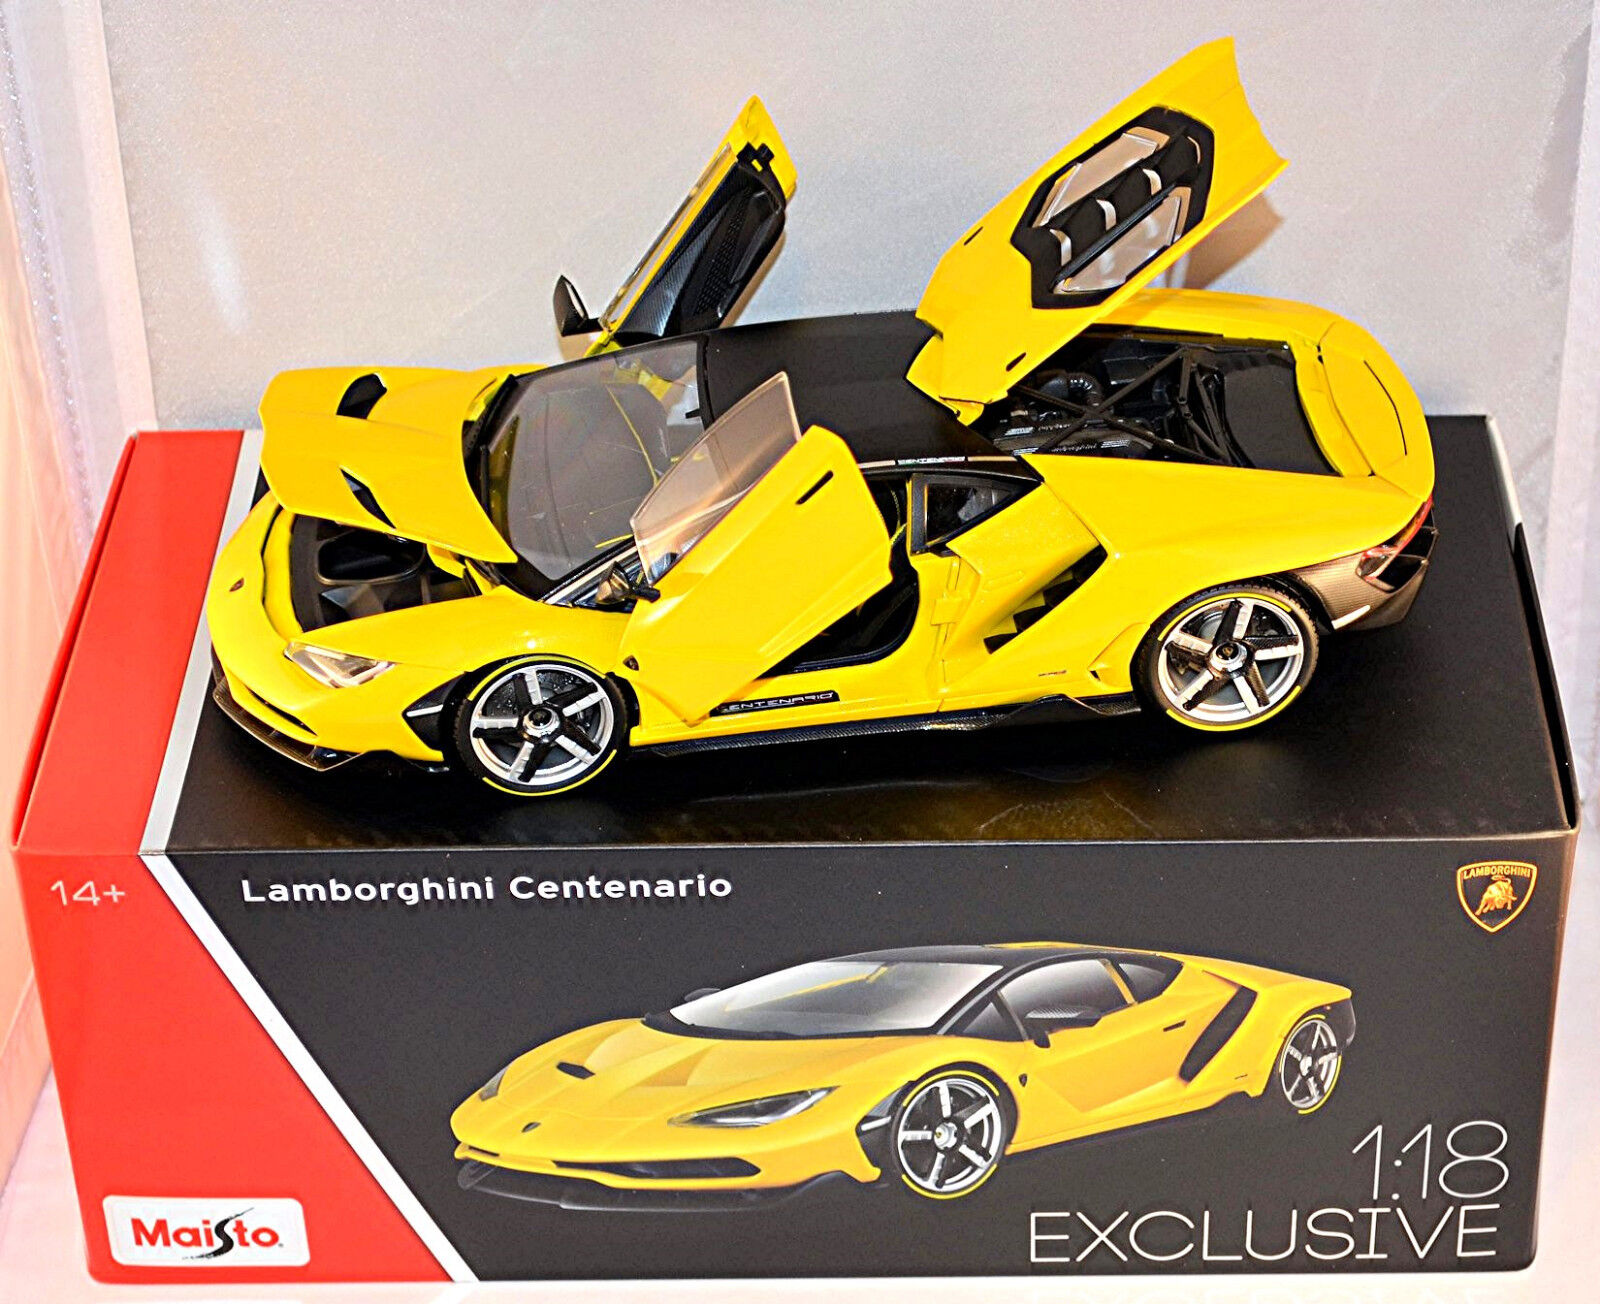 Lamborghini Centenario LP 770-4 Coupe 2016 Exclusiv Serie yellow yellow 1 18 Maist